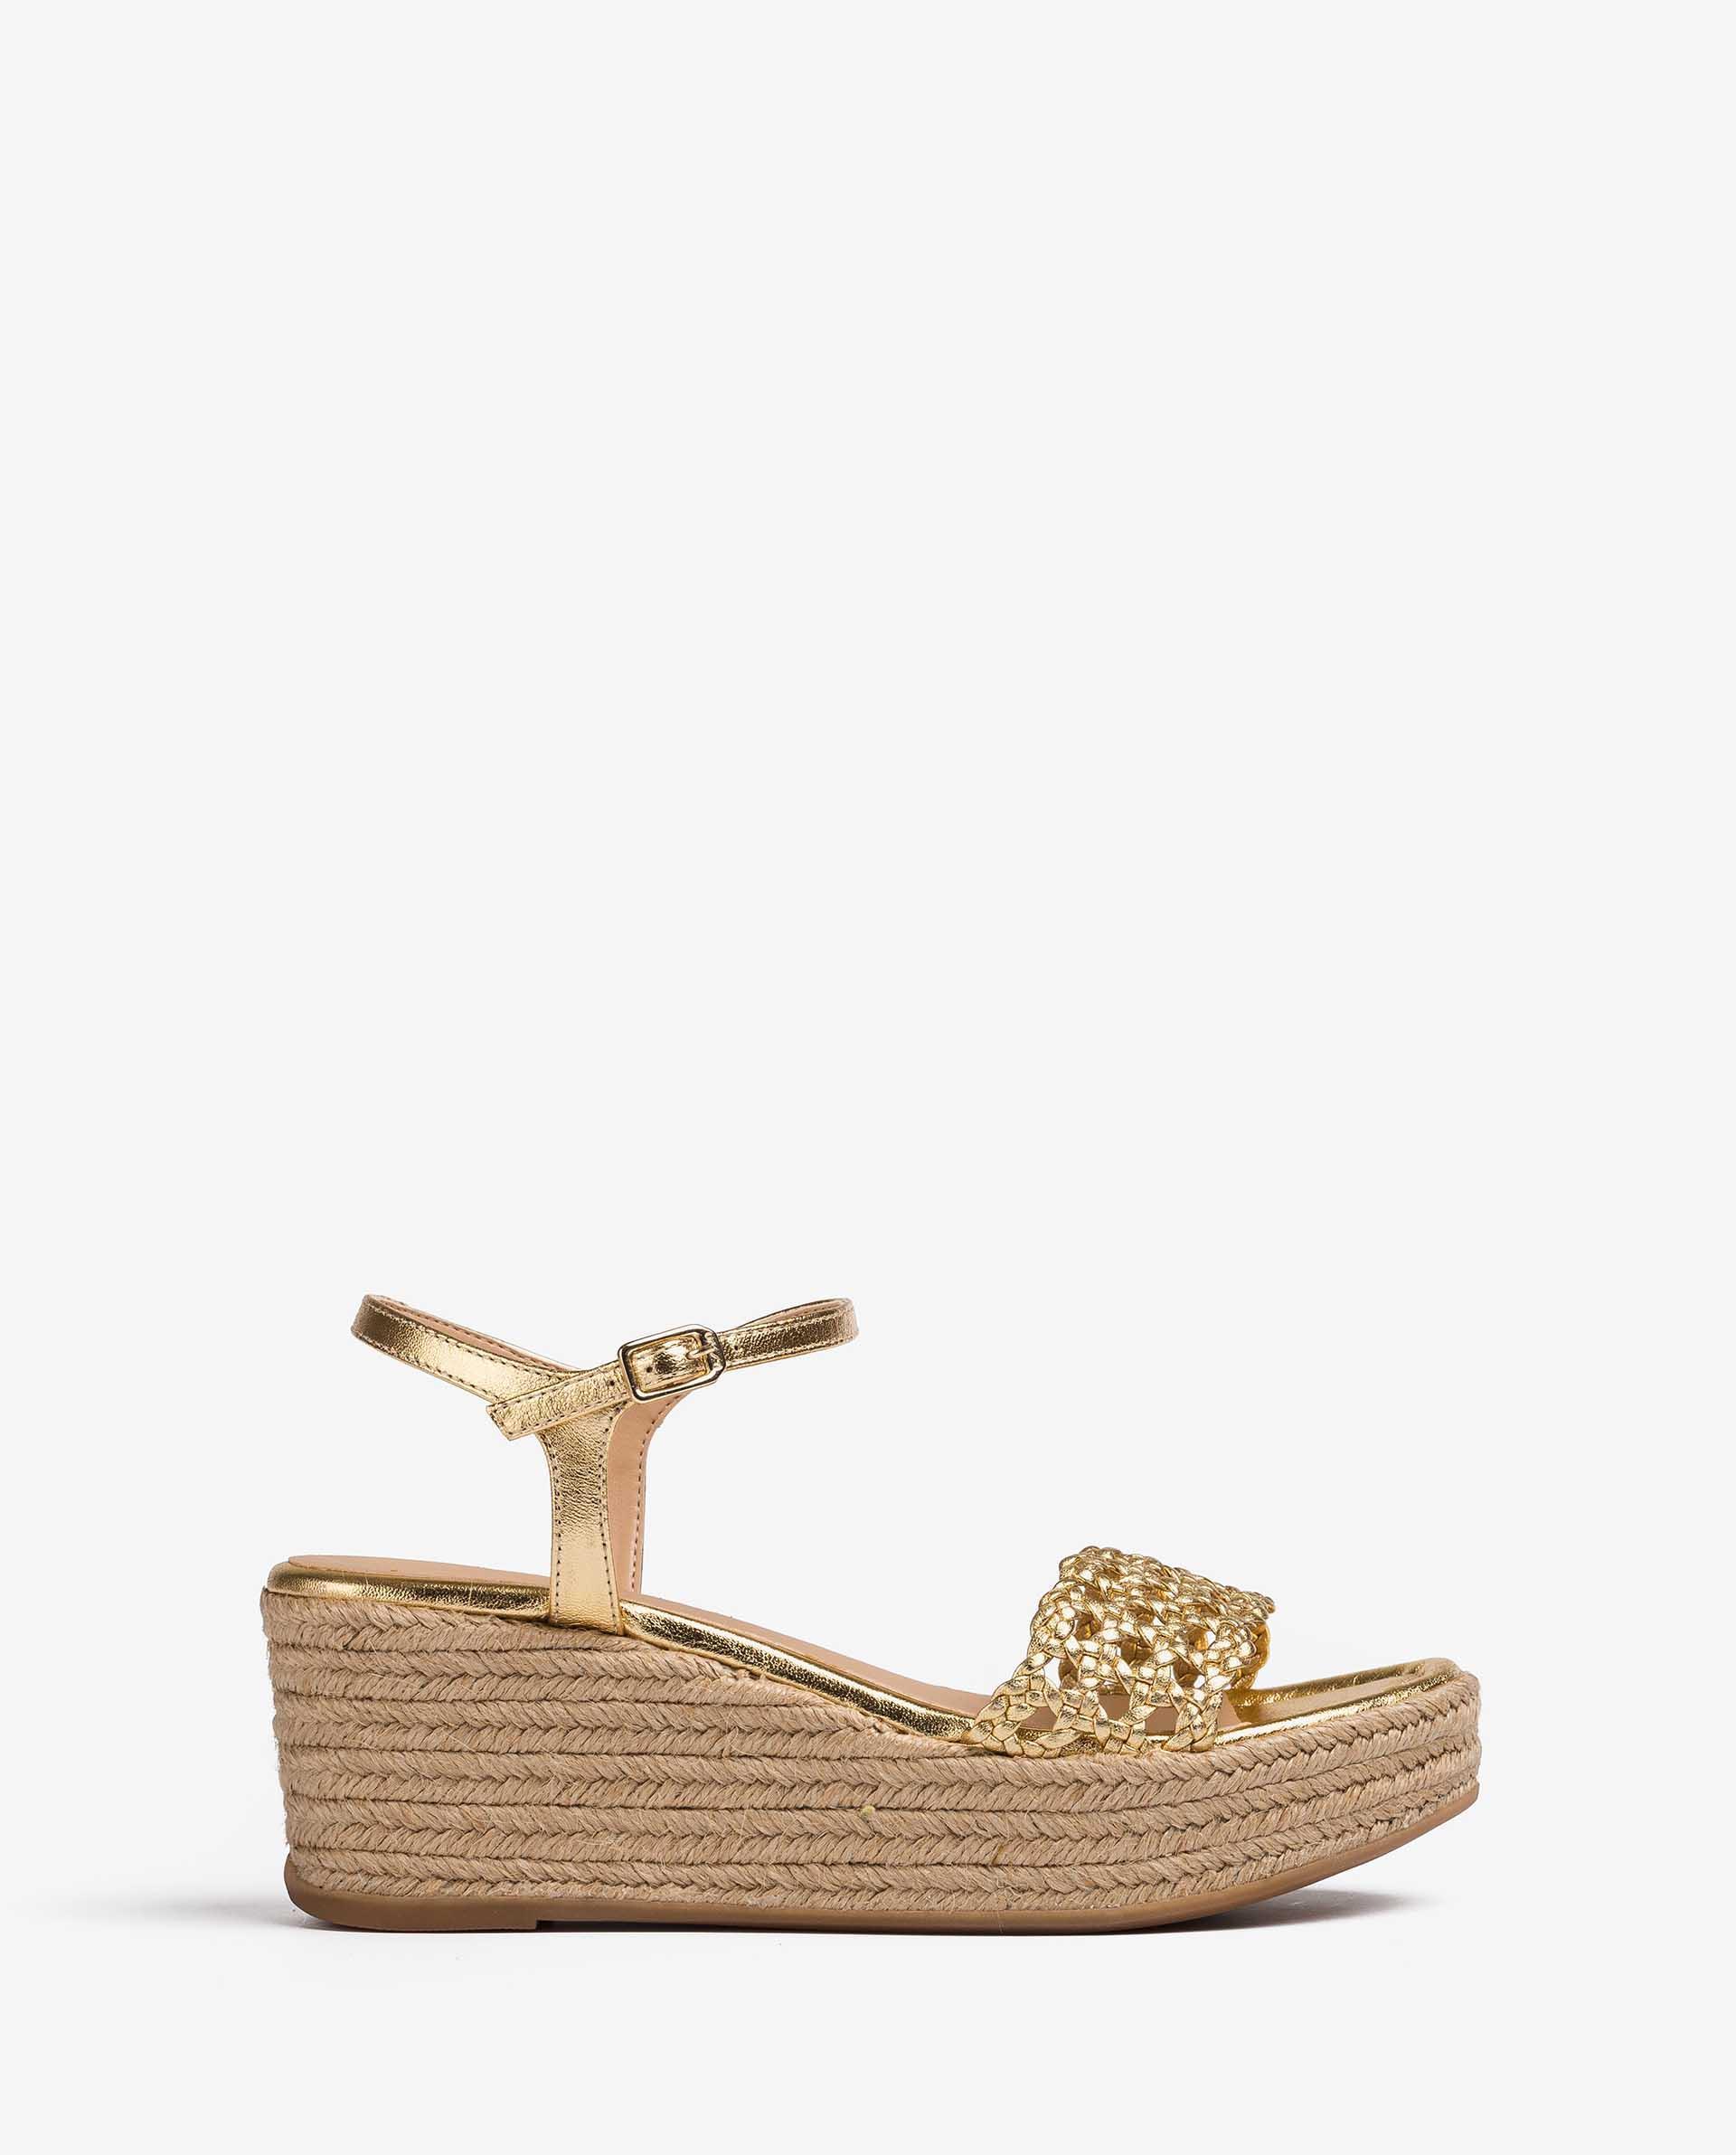 UNISA Braided wedge  metal effect leather sandals KAYTO_LMT 2